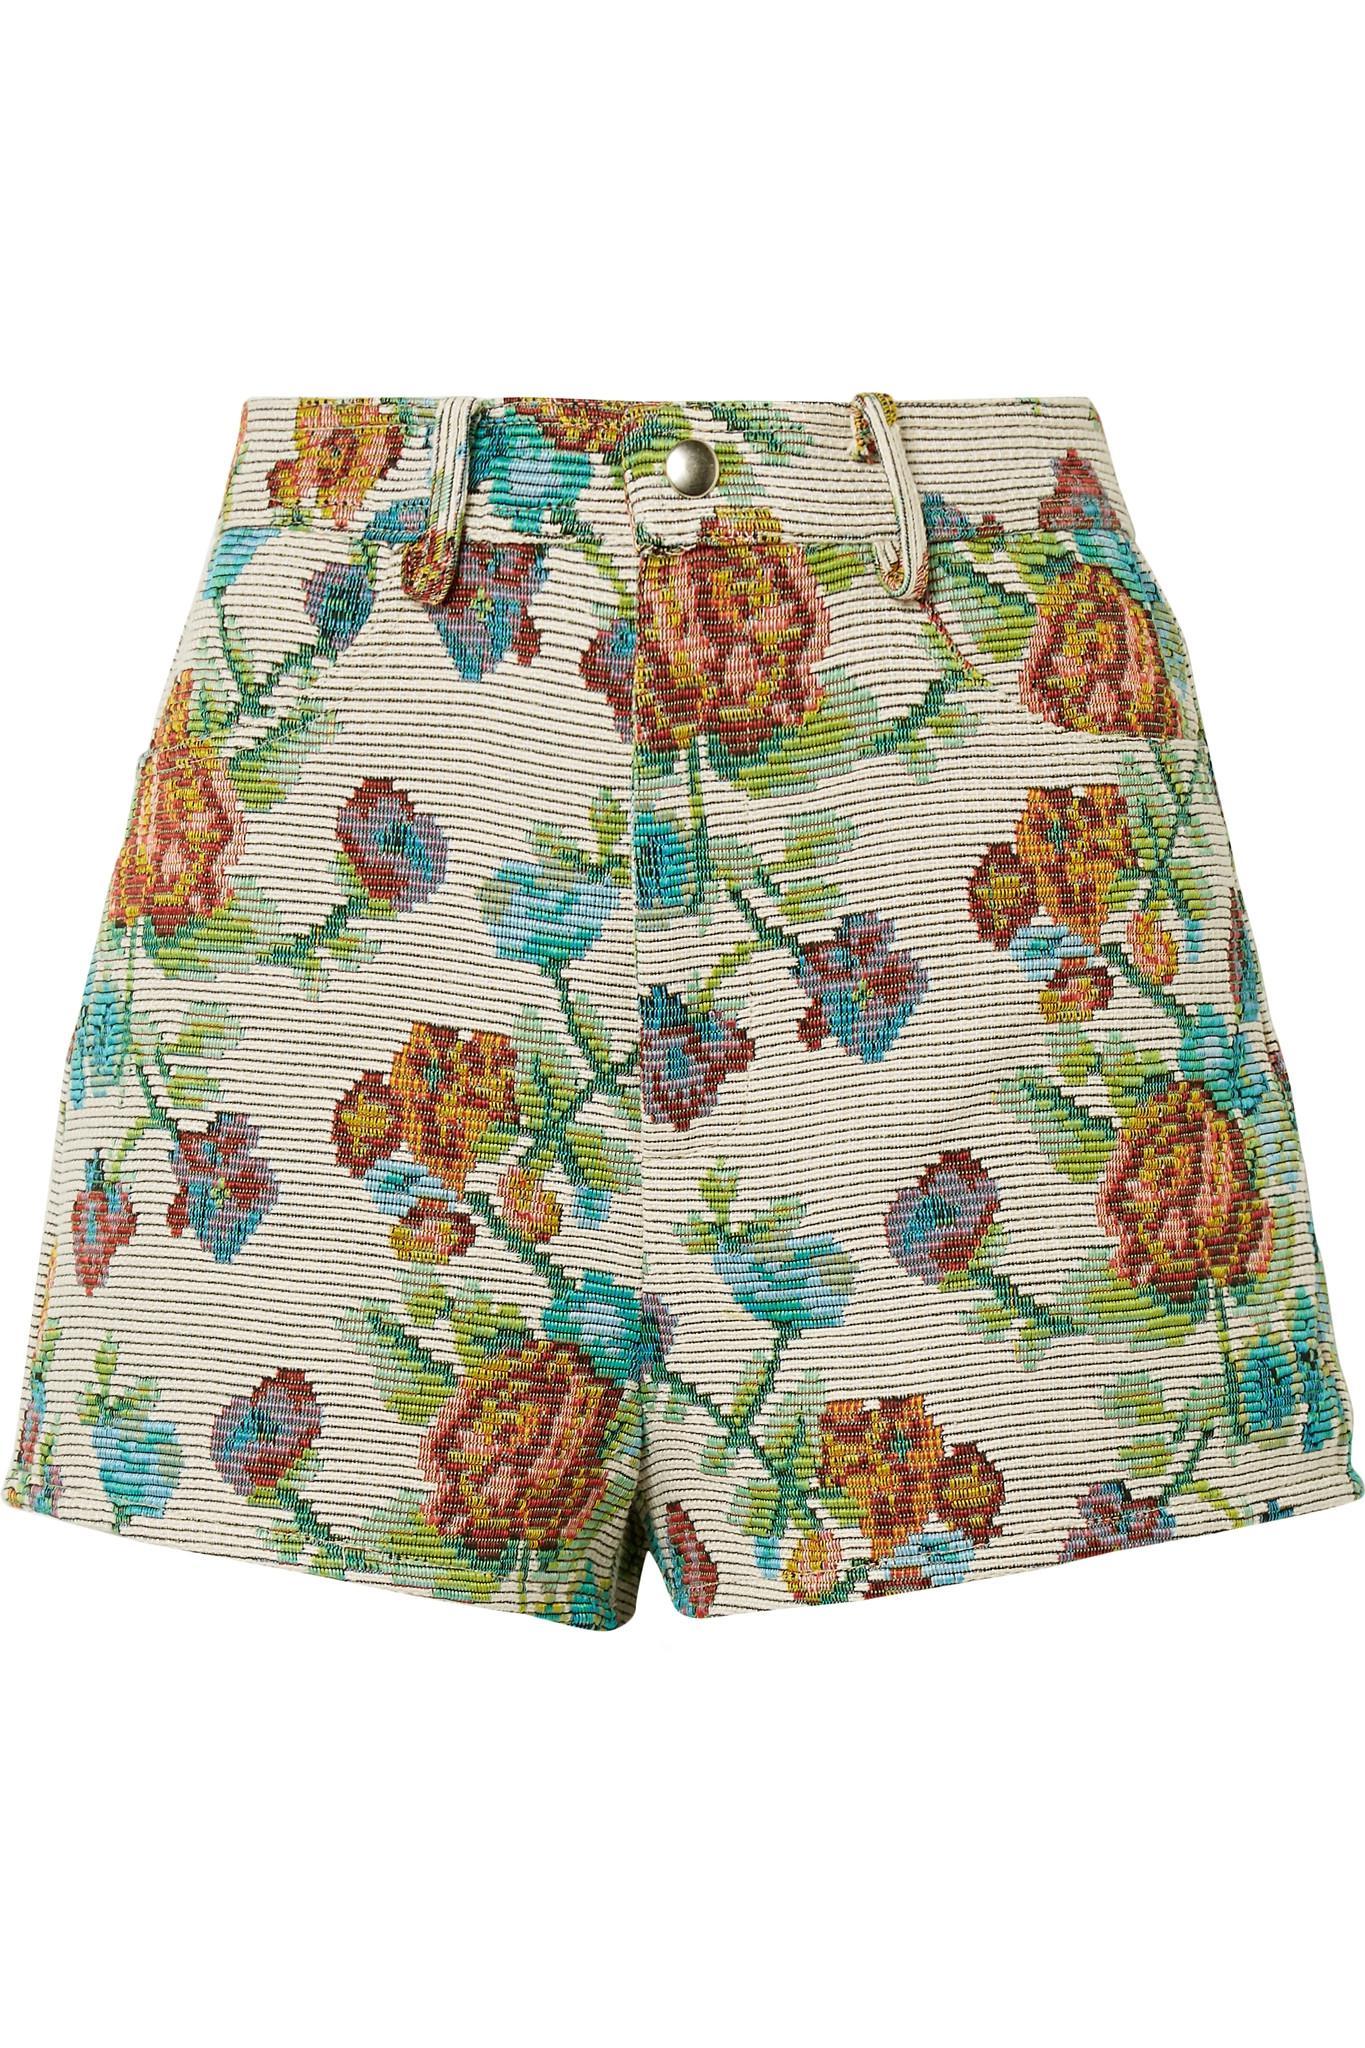 Dark Side Of The Moon Cotton-blend Jacquard Shorts - Green Anna Sui GhJQ8